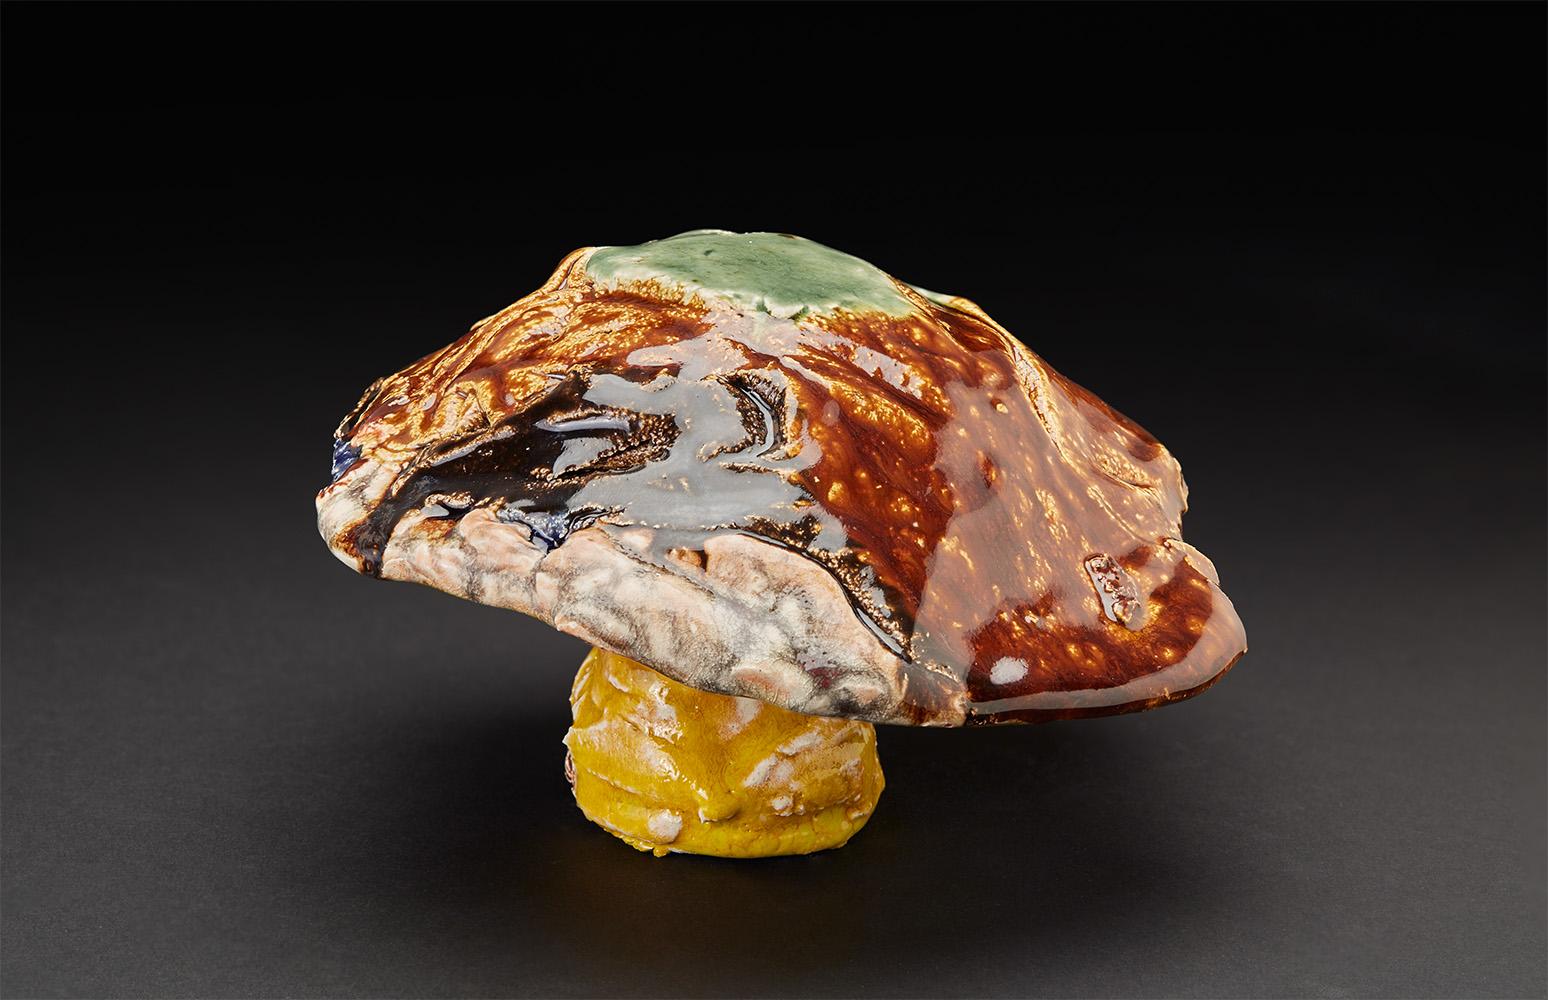 Straiph Wilson    Gusion  , 2016 Ceramic 4 x 6 x 6 inches 10.2 x 15.2 x 15.2 cm StWi 9